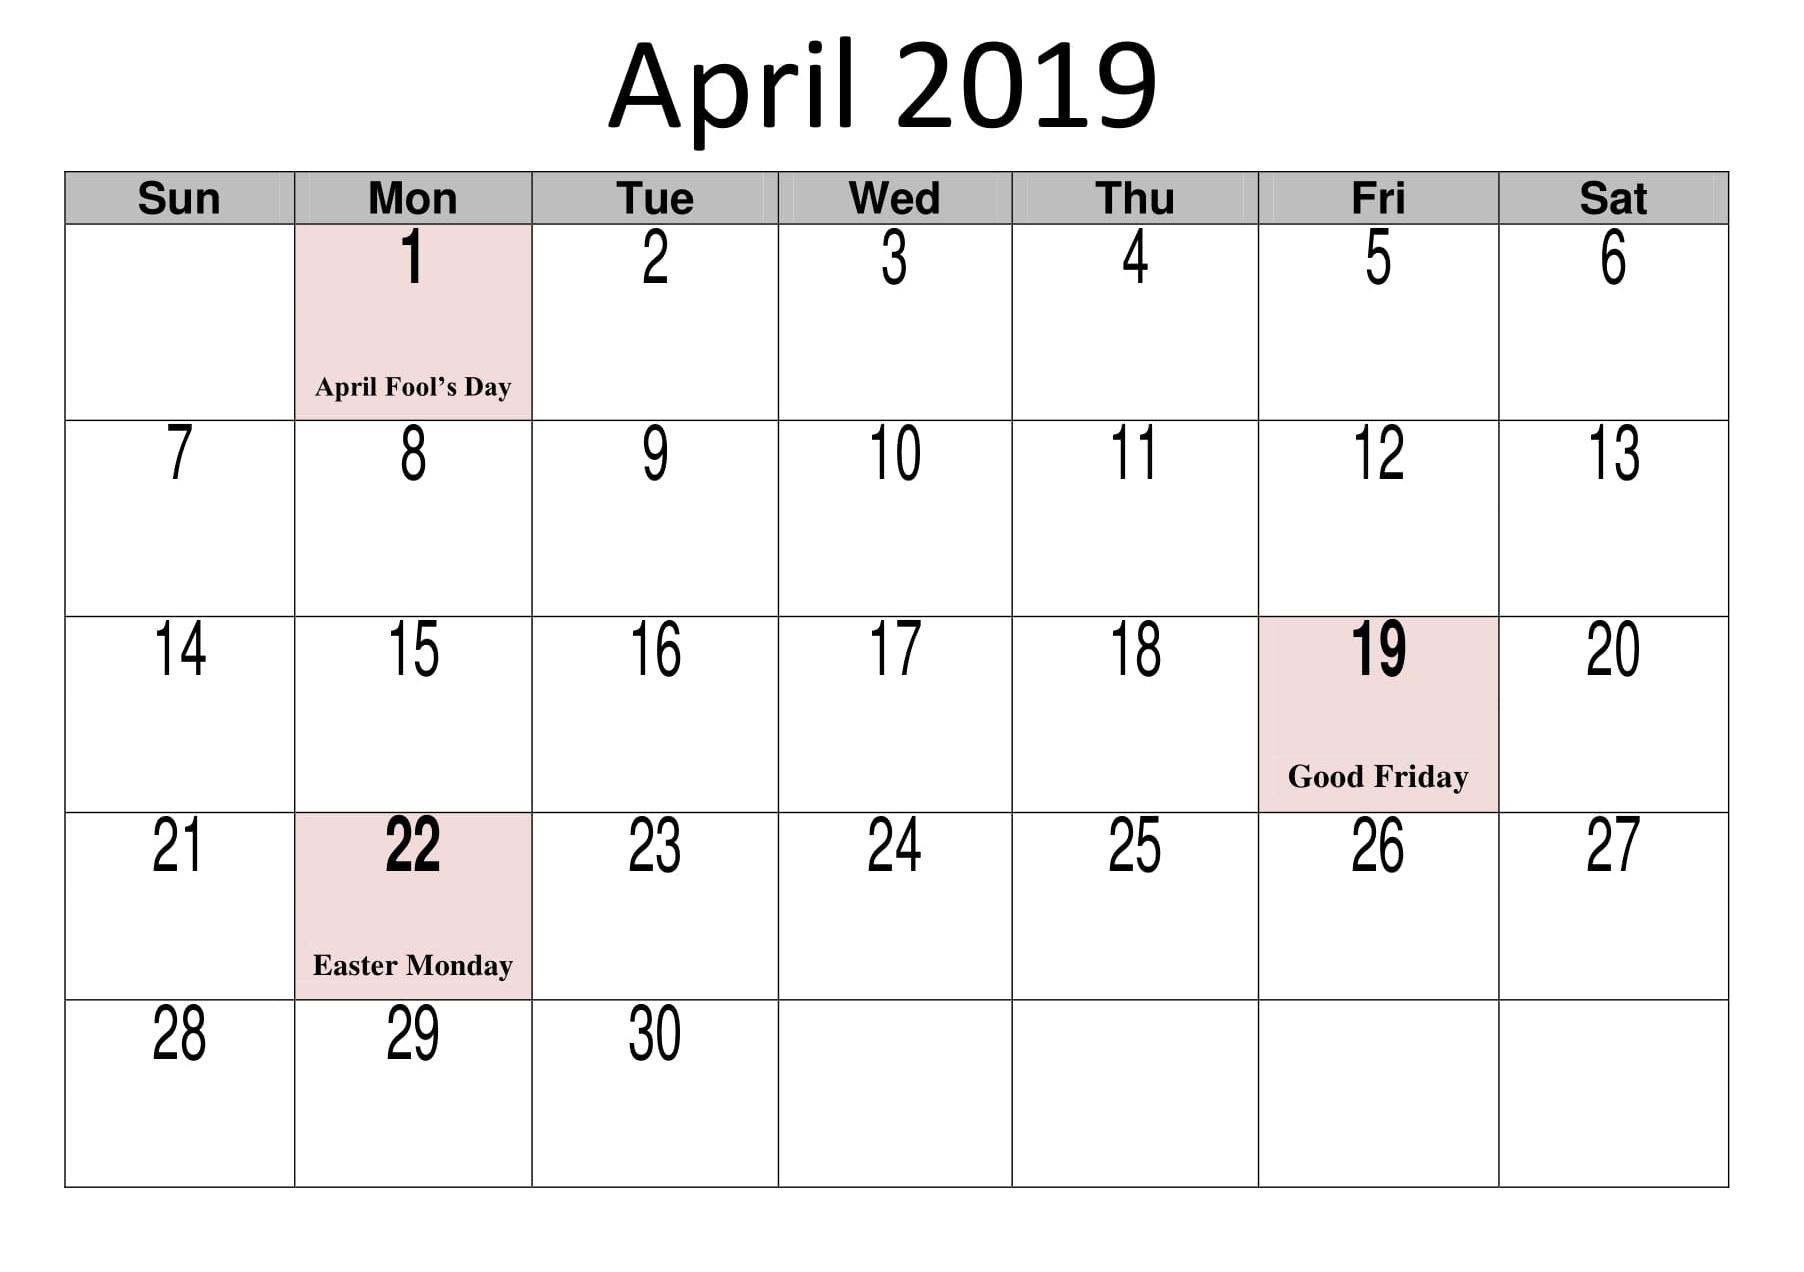 April 2019 Calendar With Holidays Template - Free Printable Calendar intended for Calendar With Holidays Templates